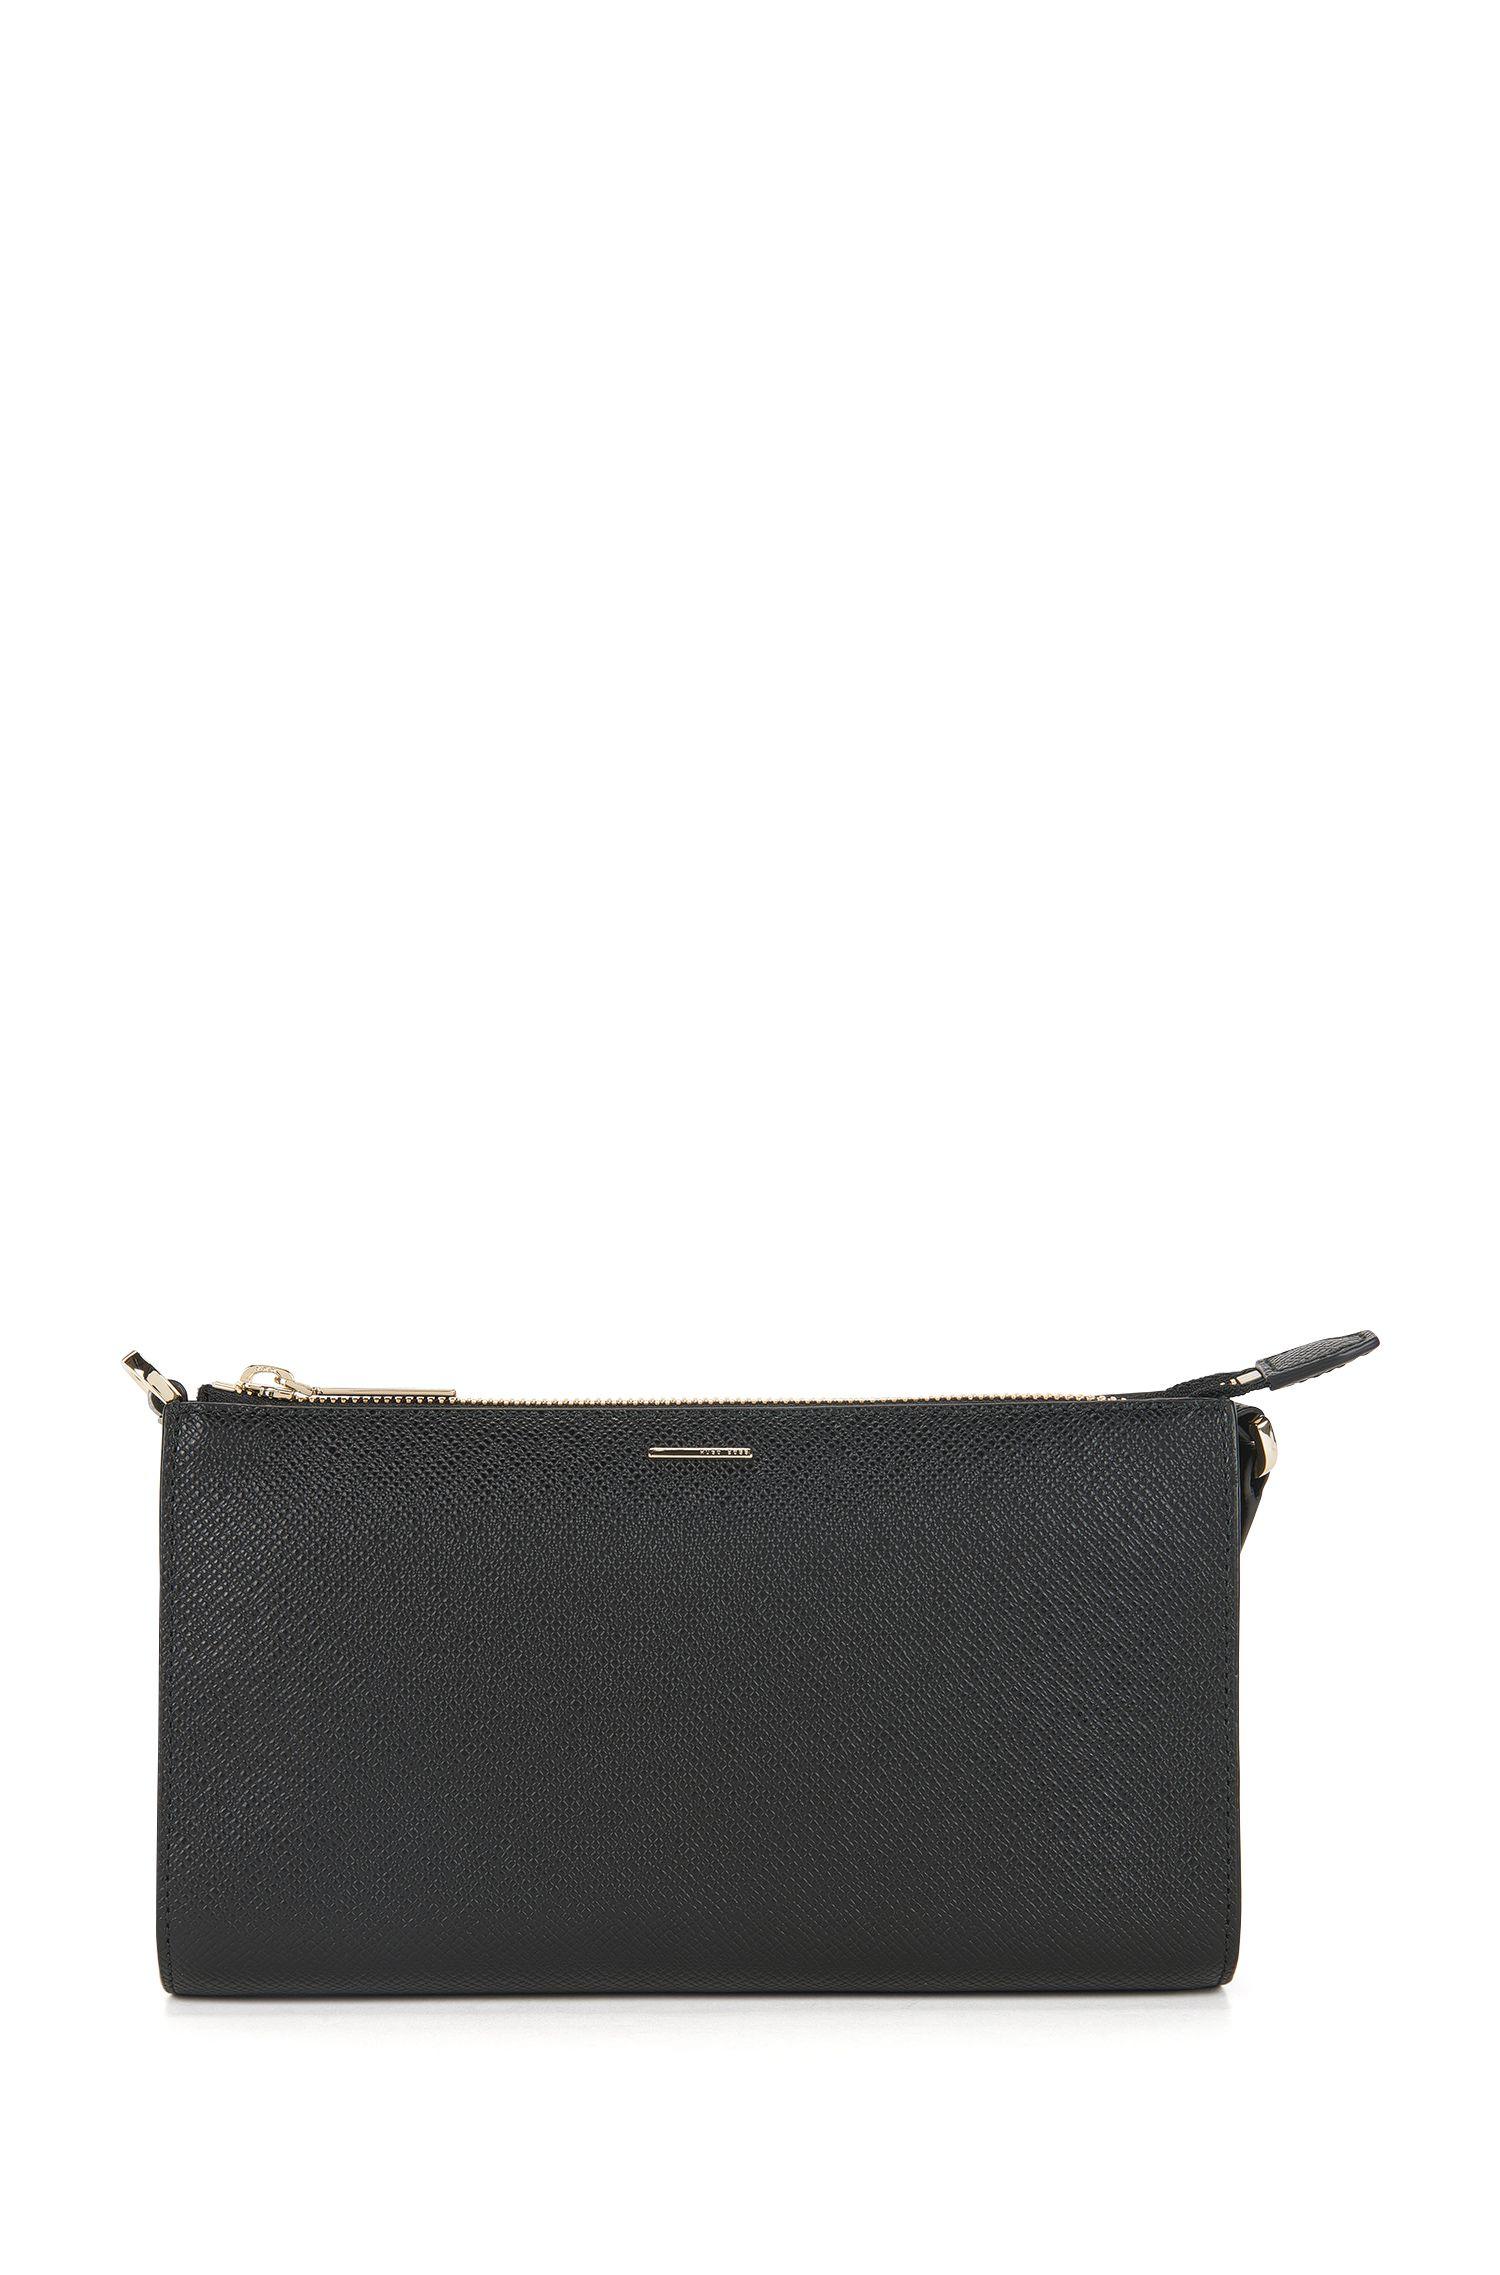 BOSS Luxury Staple vanity bag in leather